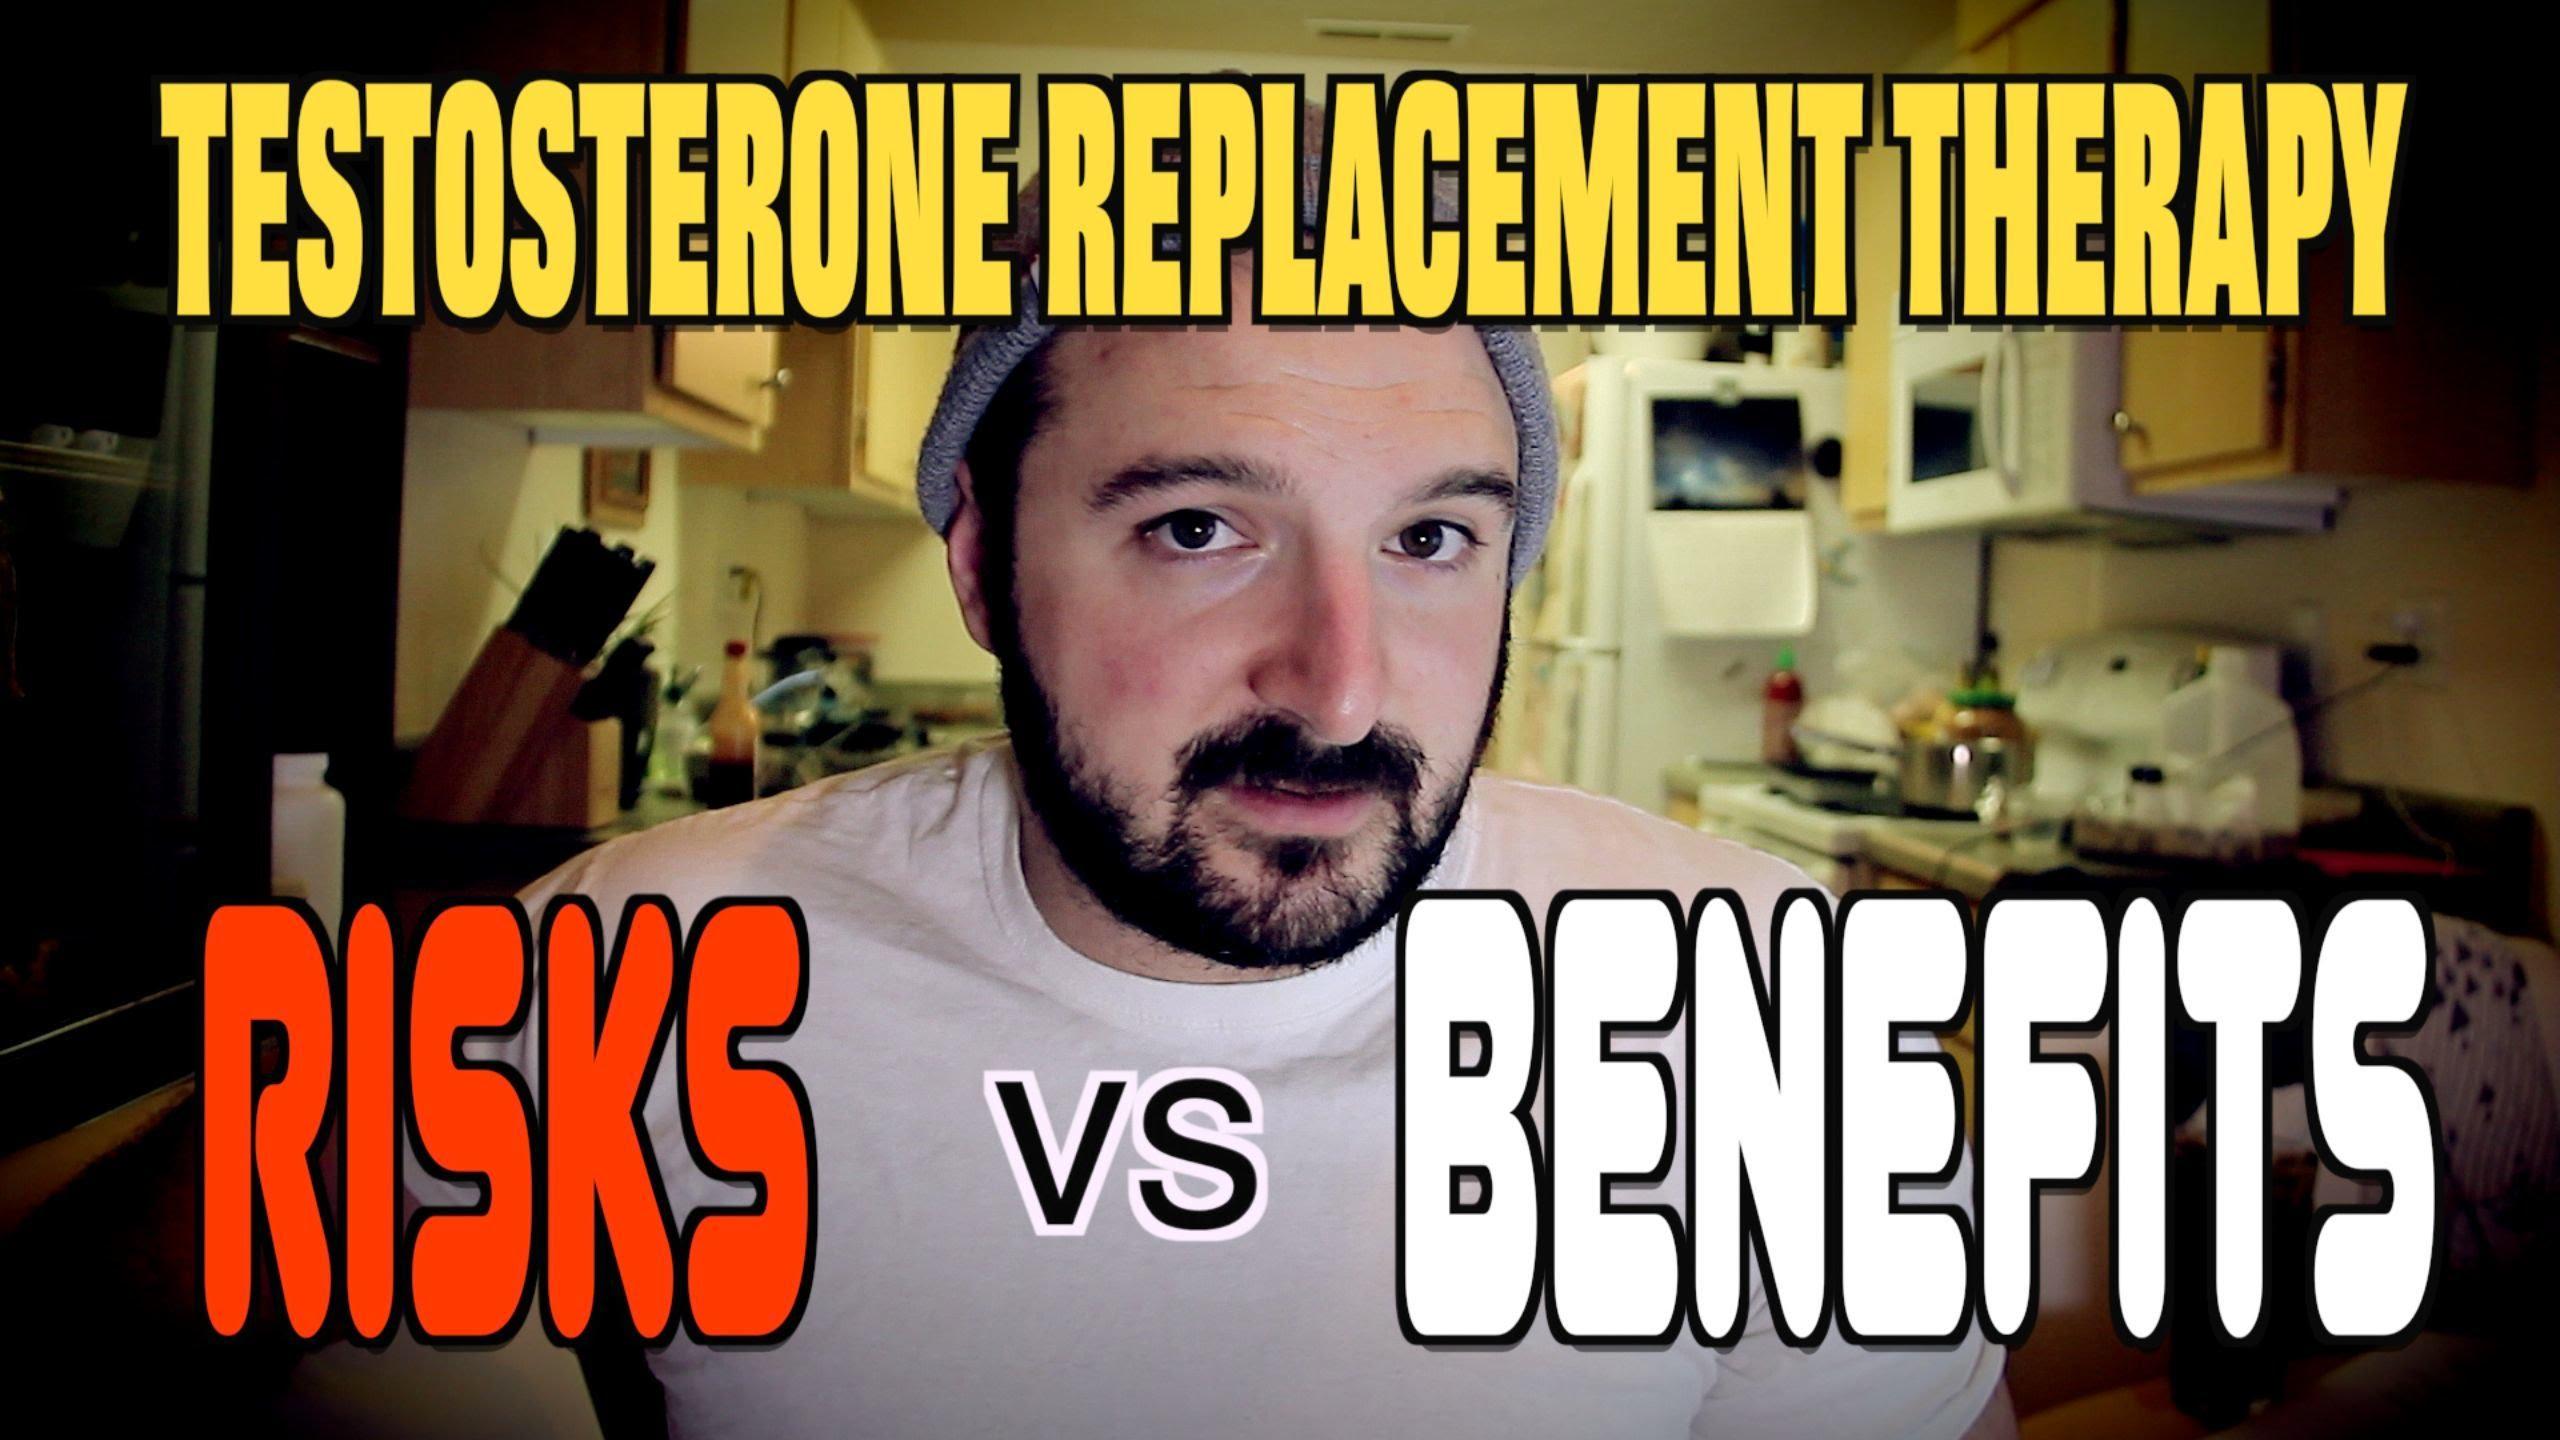 testoterone